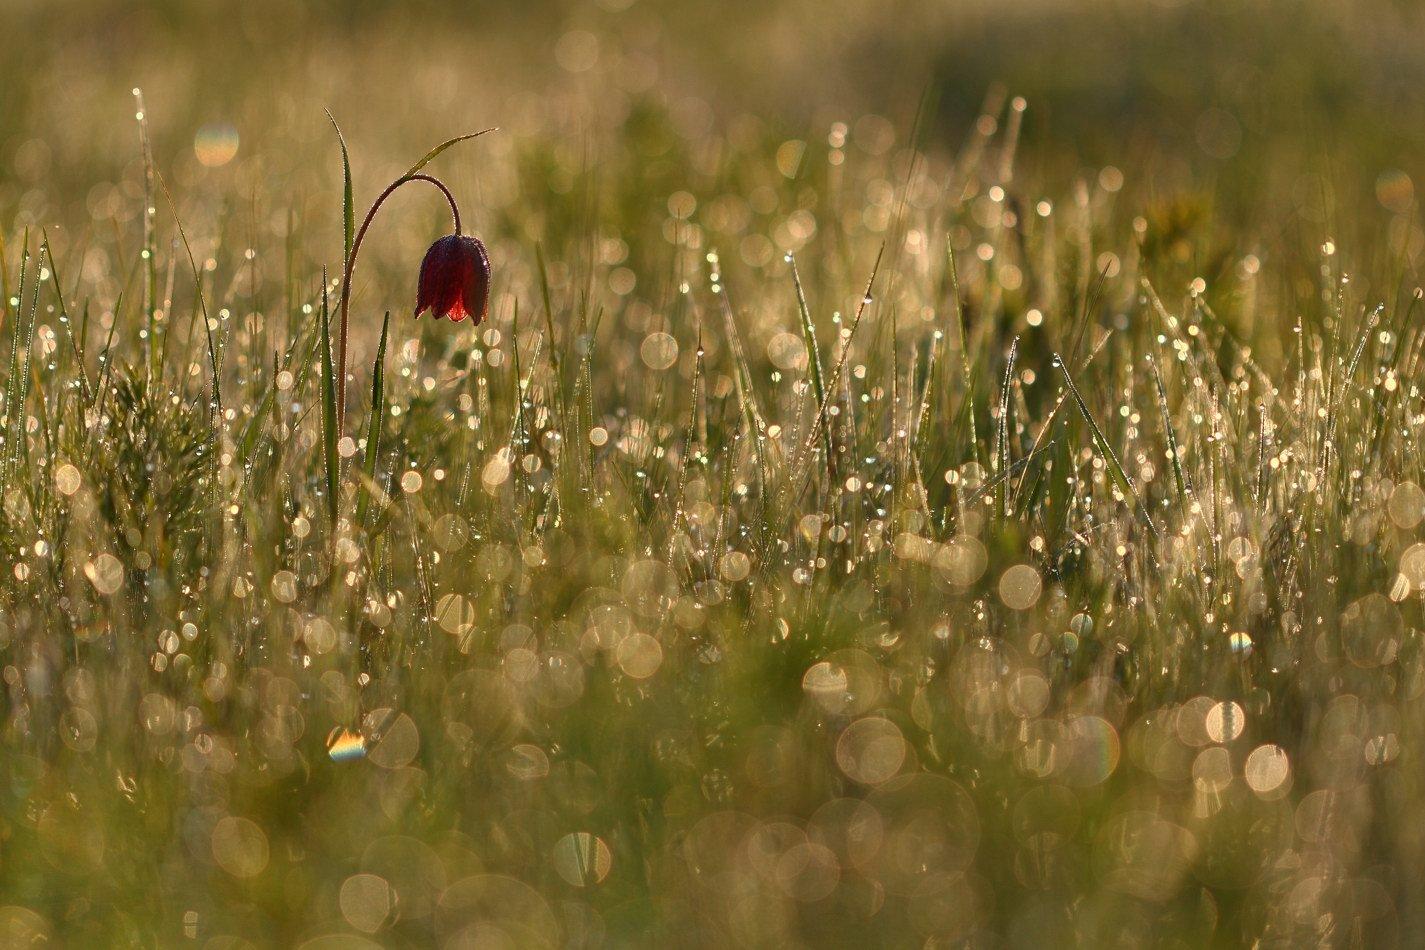 fritillaria, meleagroides, малый, рябчик, самарский лес, Сергій Марков